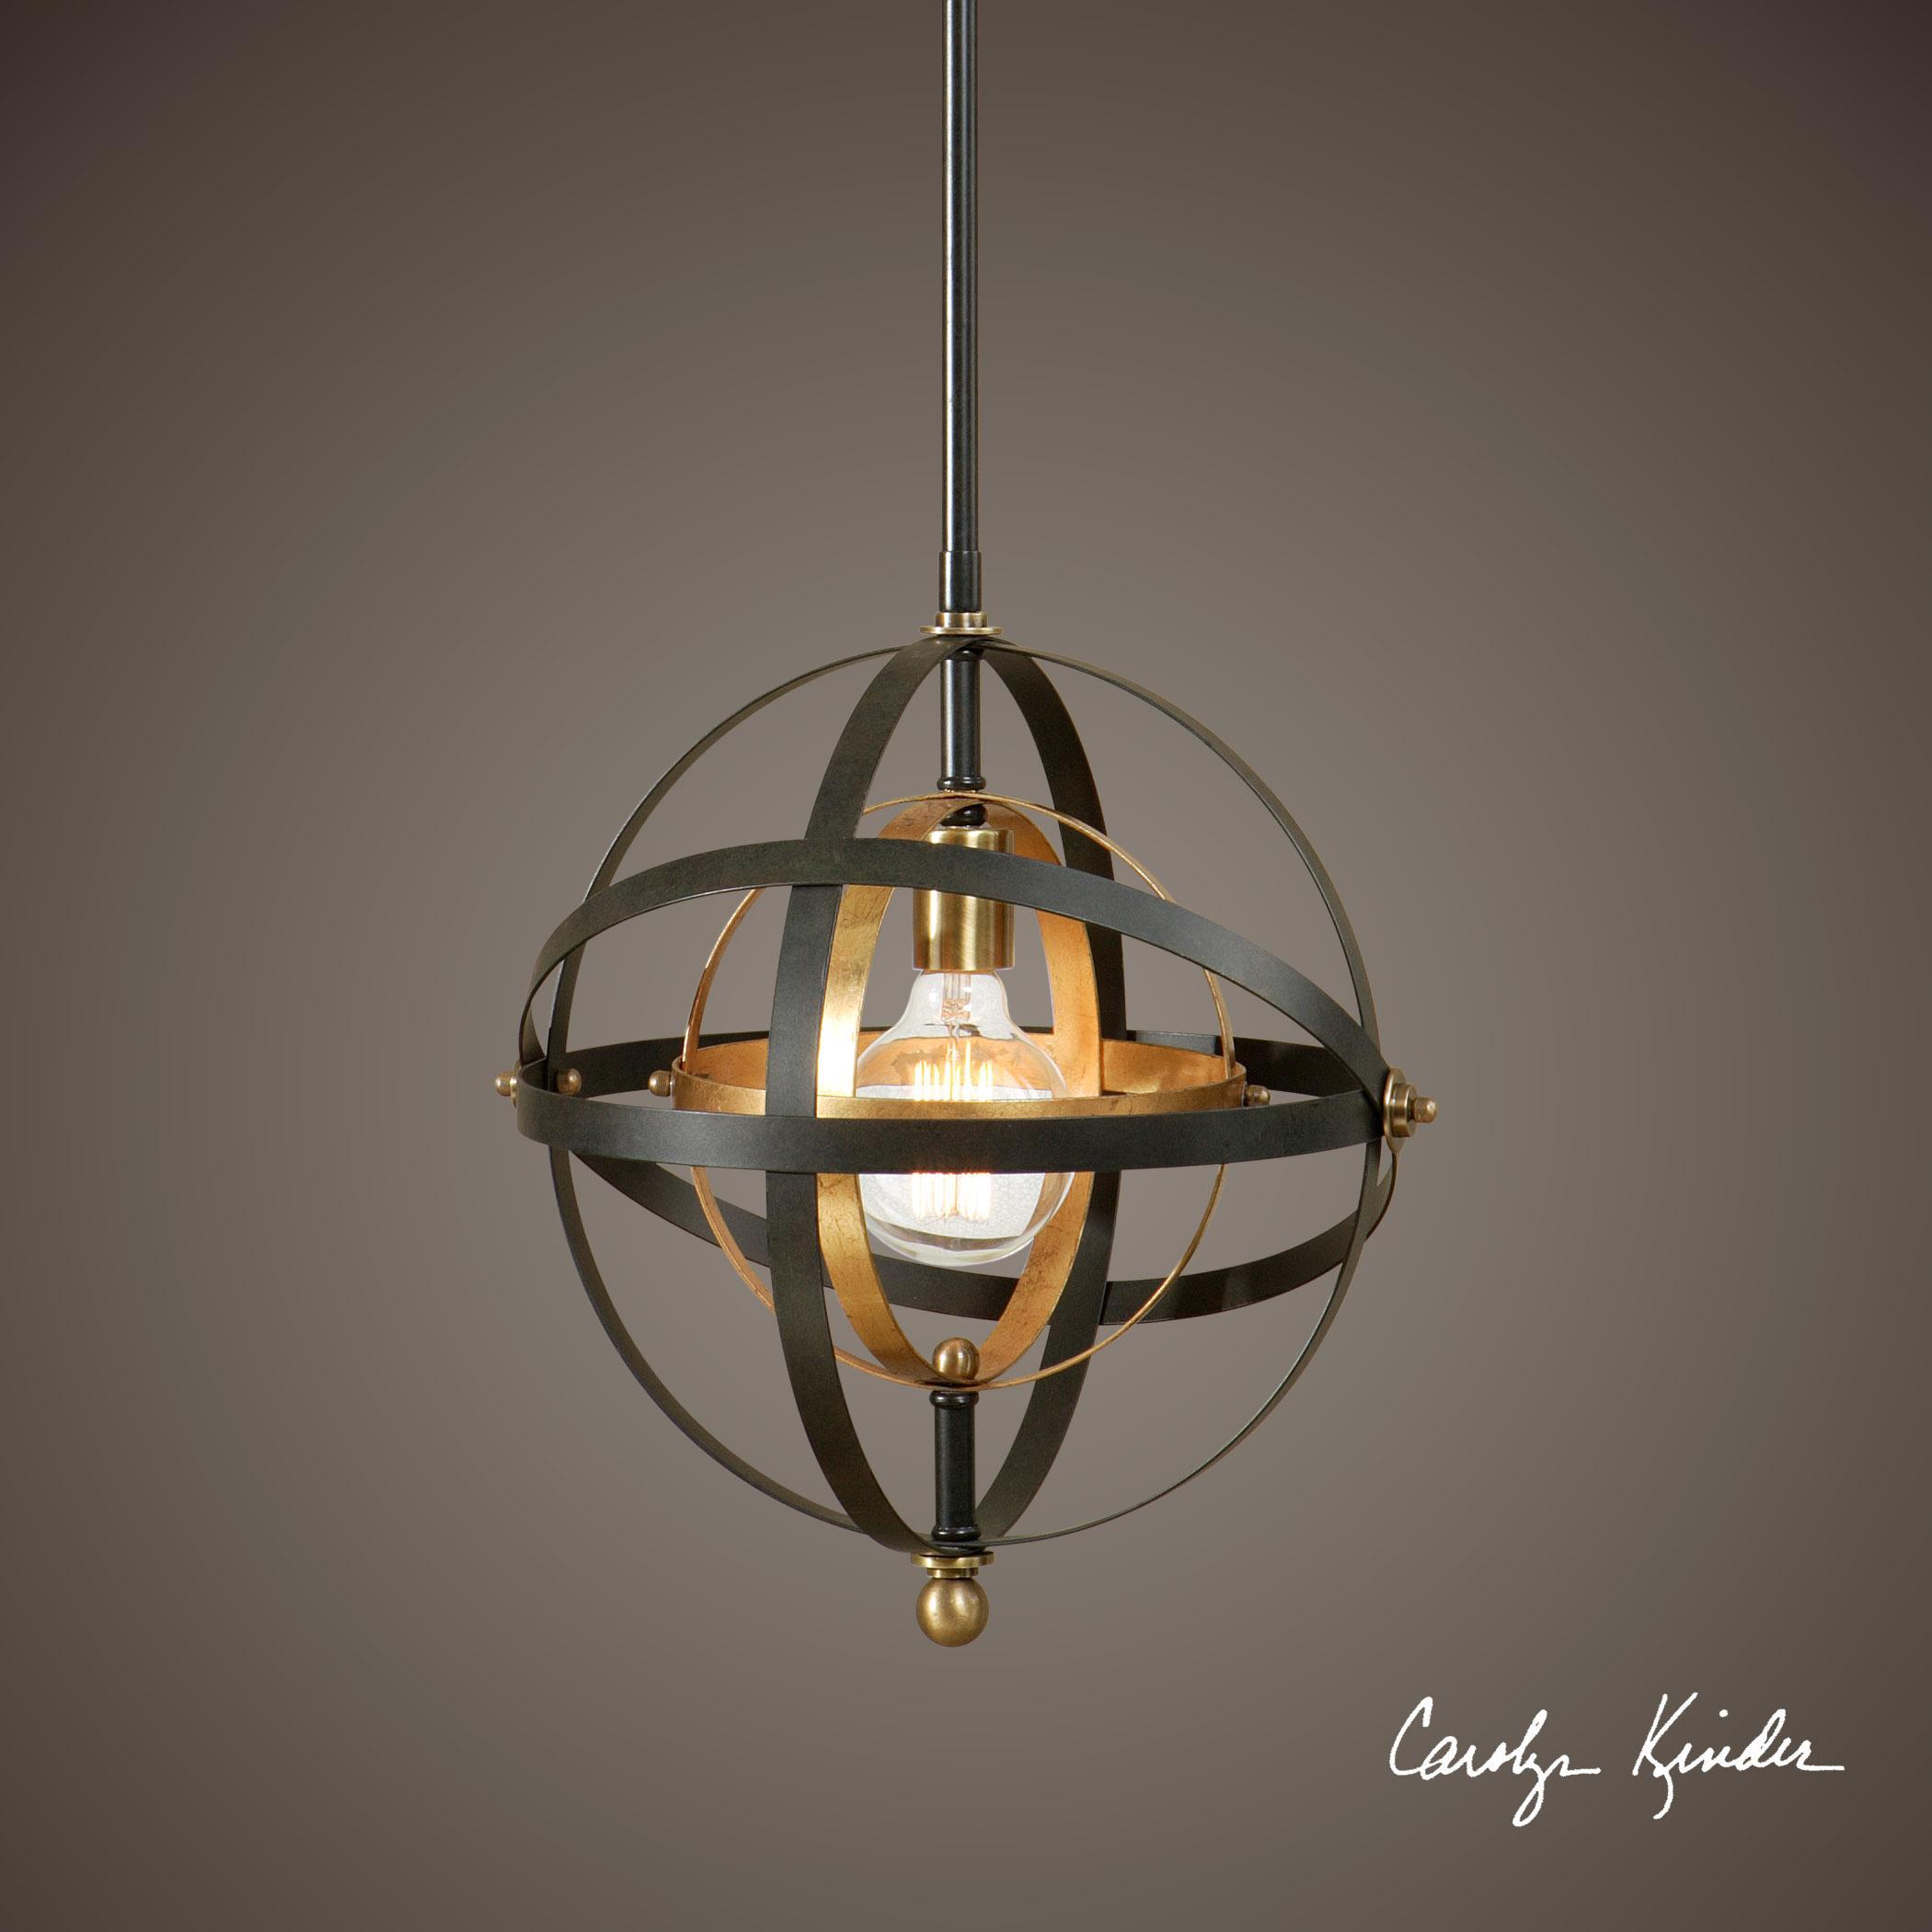 Hanging Light Spheres: Uttermost Lighting Fixtures 22039 Rondure 1 Light Sphere